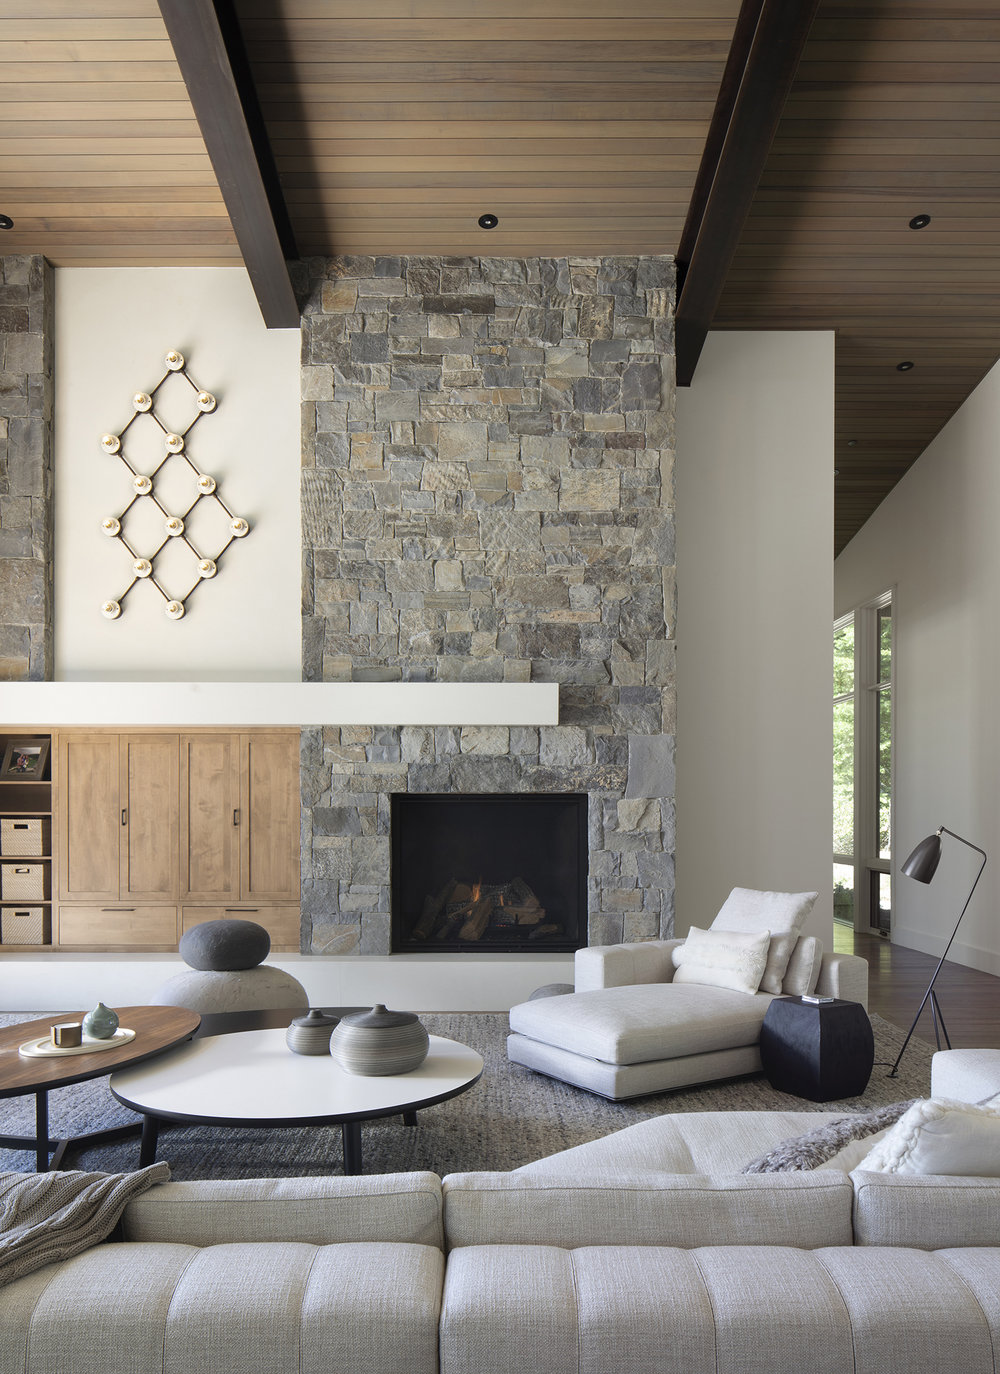 Lot 188_Living Room_Masonry Fireplace Surround_Wood Ceilings.jpg